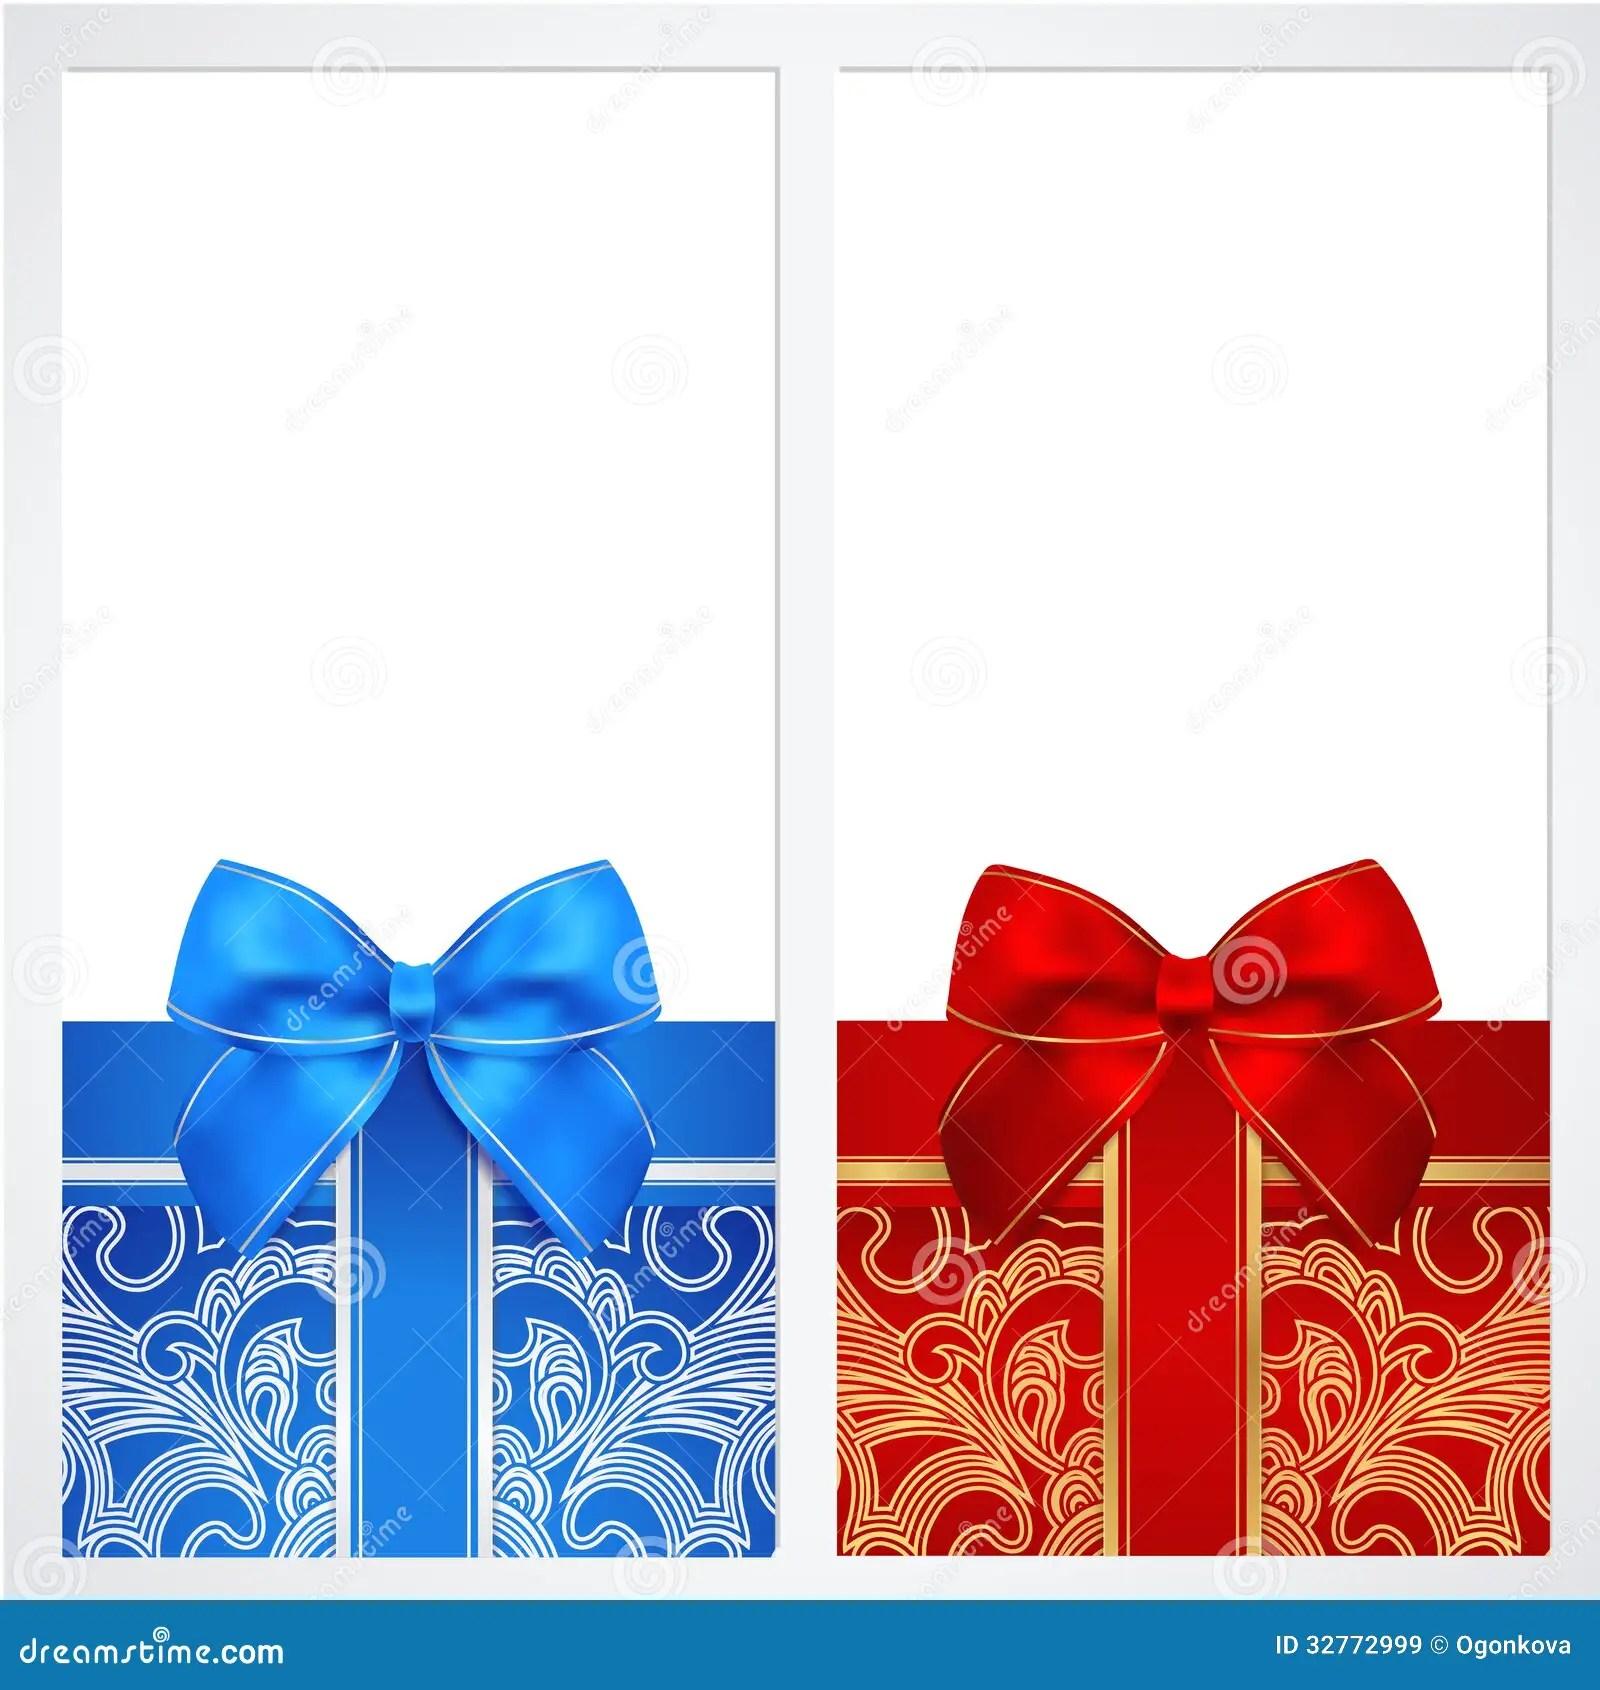 gift coupon template sample cv service gift coupon template gift template gift certificate templates voucher gift certificate coupon template